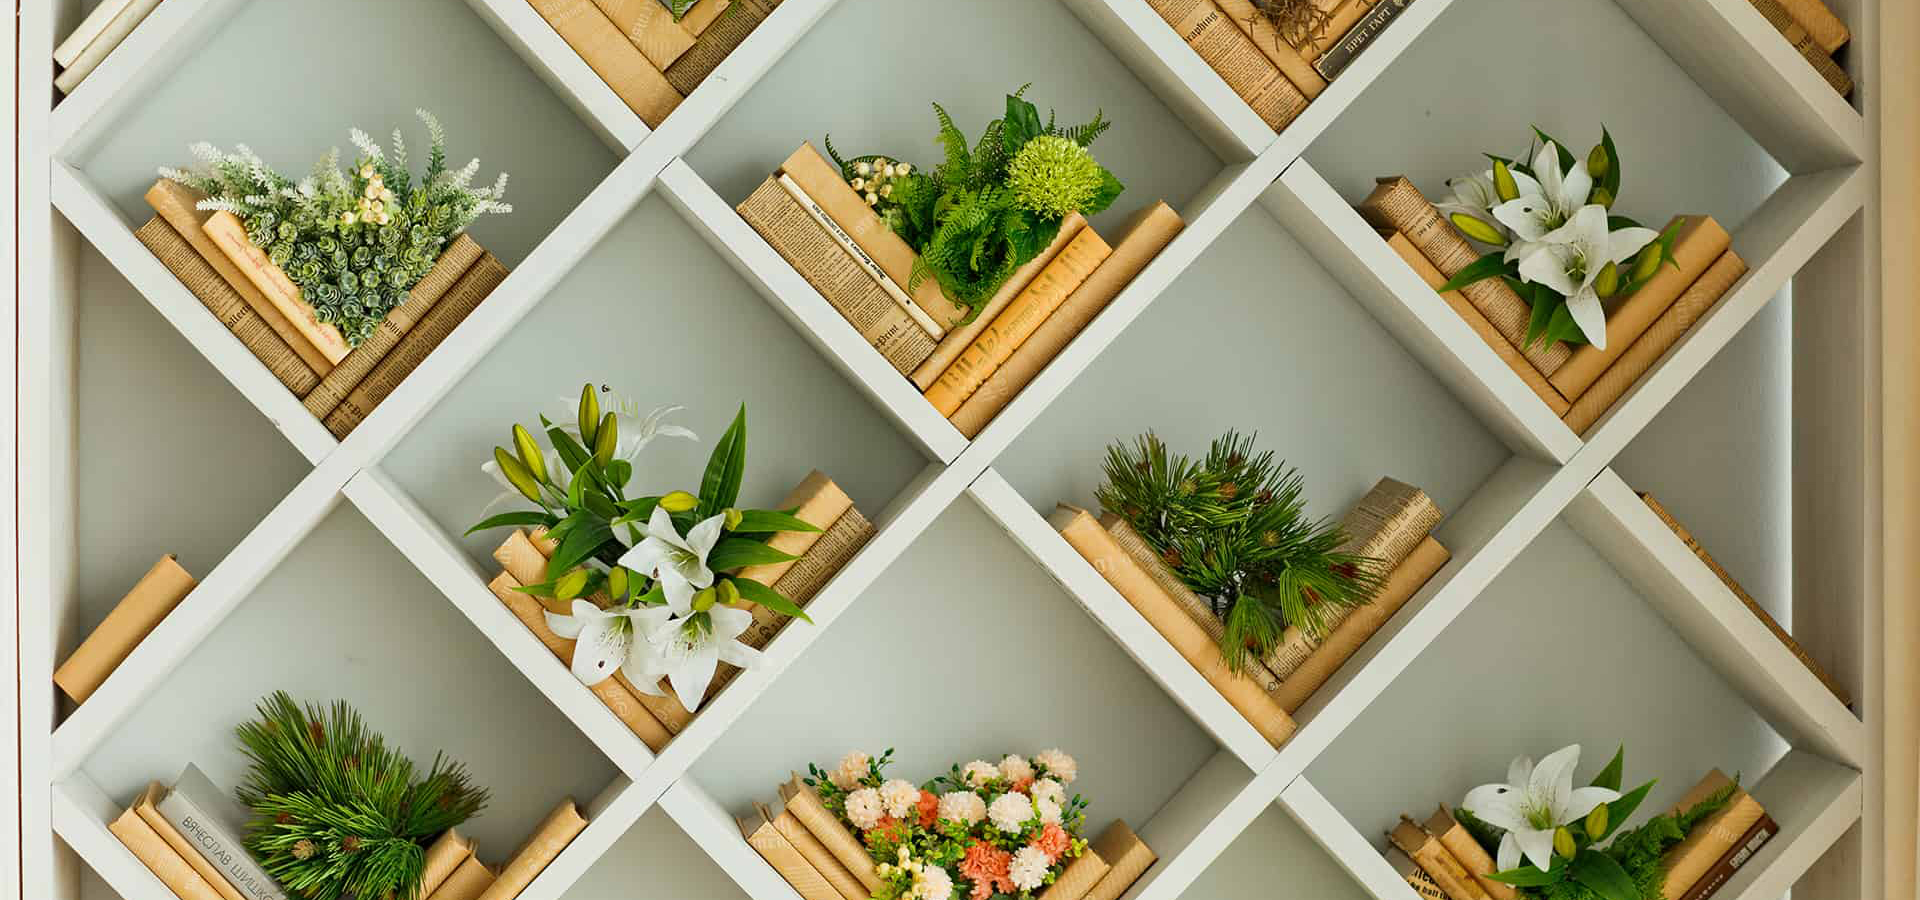 Bookshelf Decorating Tips and Tricks